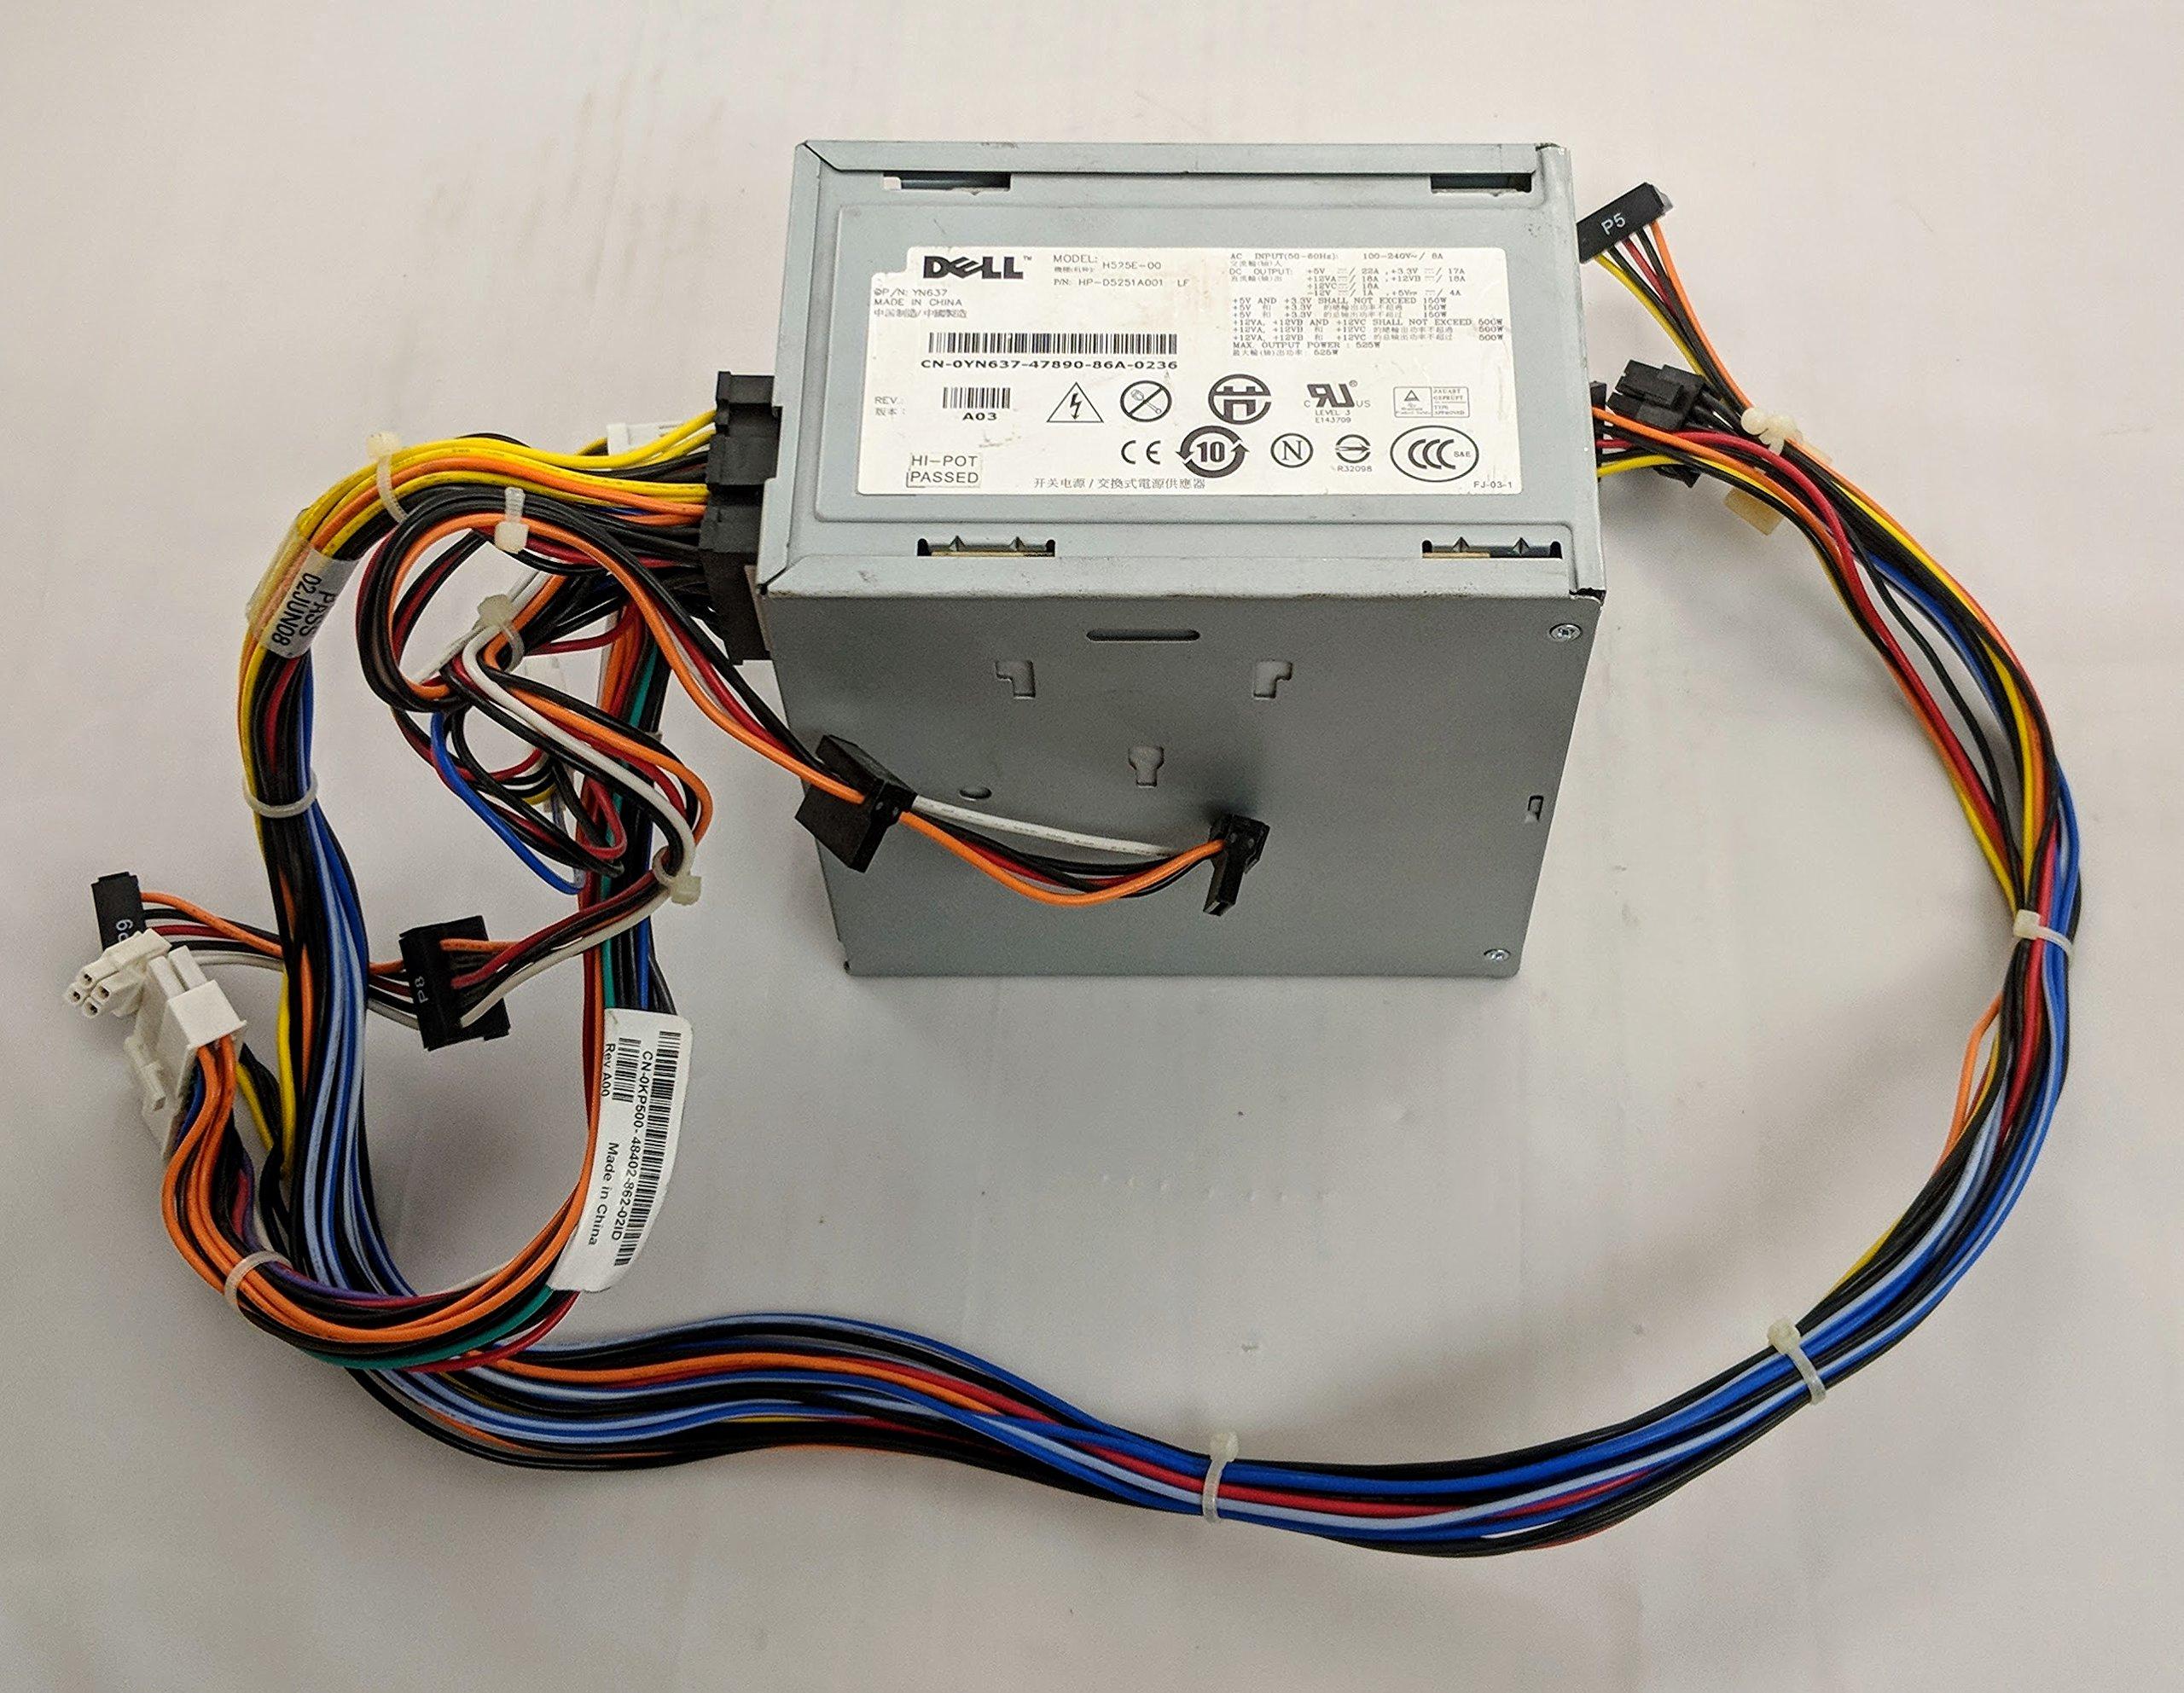 NPS-525AB A. Model Dell Precision T3400 525W Power Supply